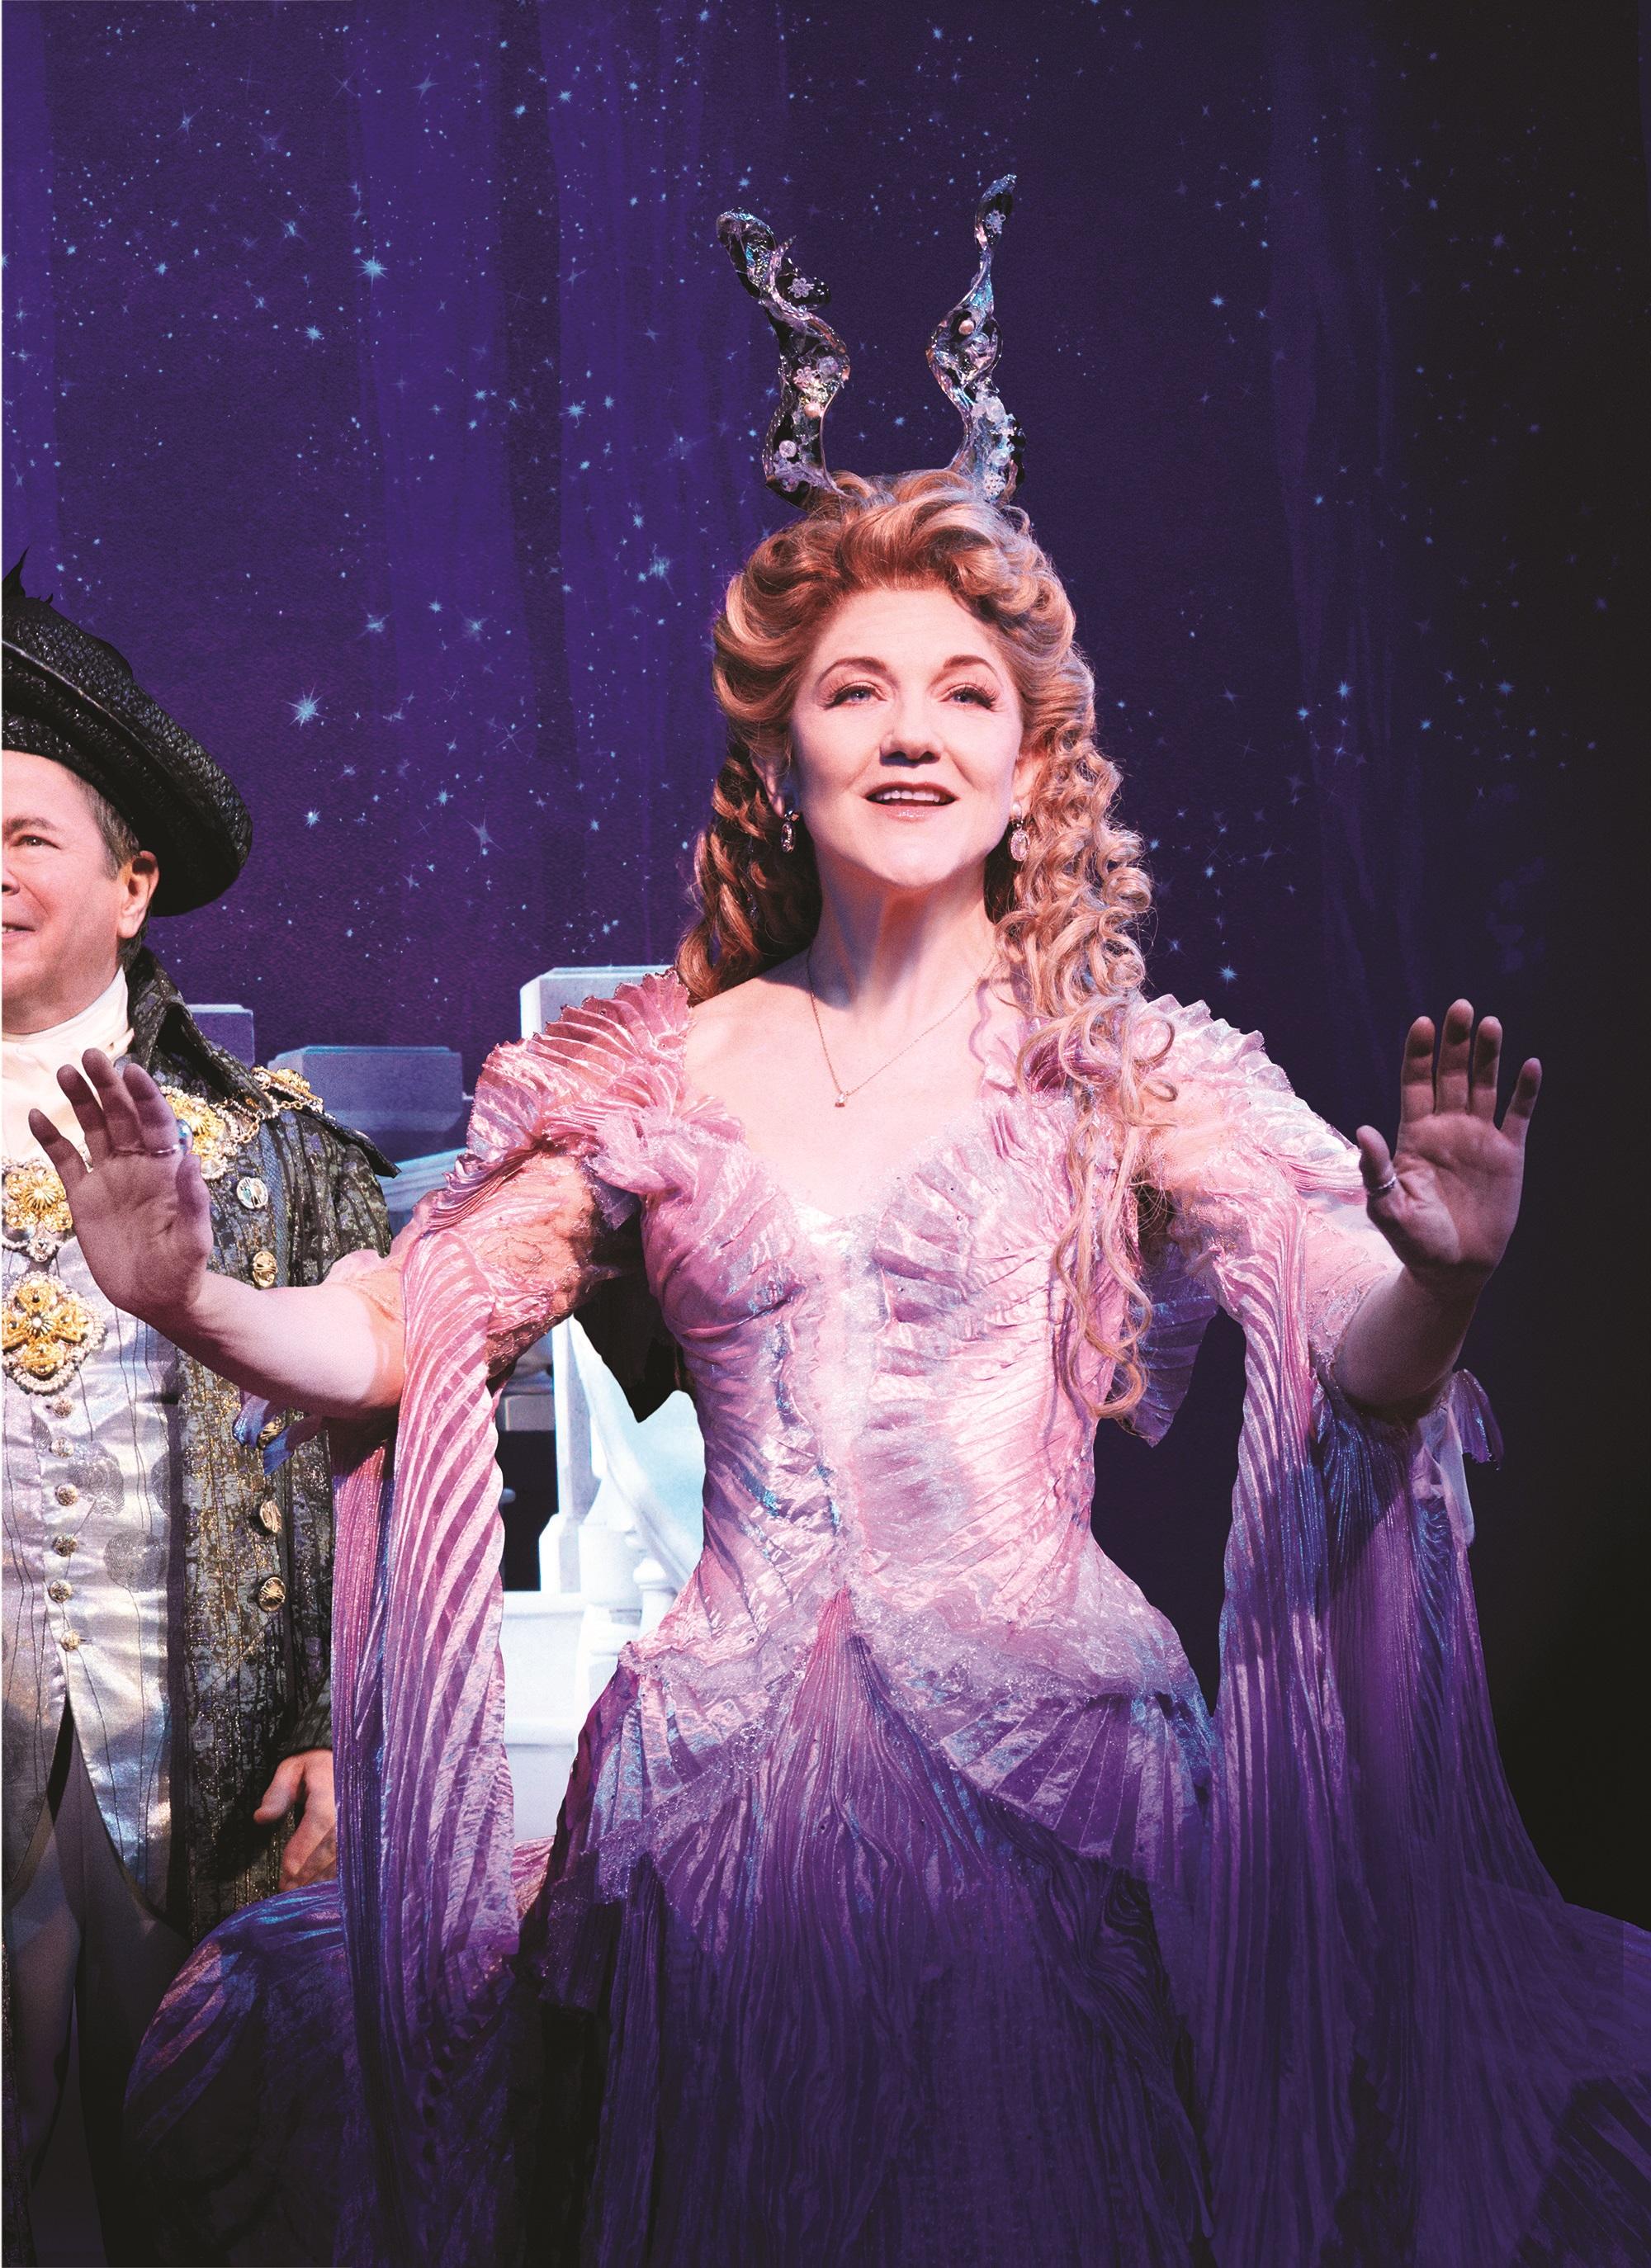 Victoria Clark in a Tony Award winning costume from Broadway's CINDERELLA. Photo courtesy of Carol Rosegg